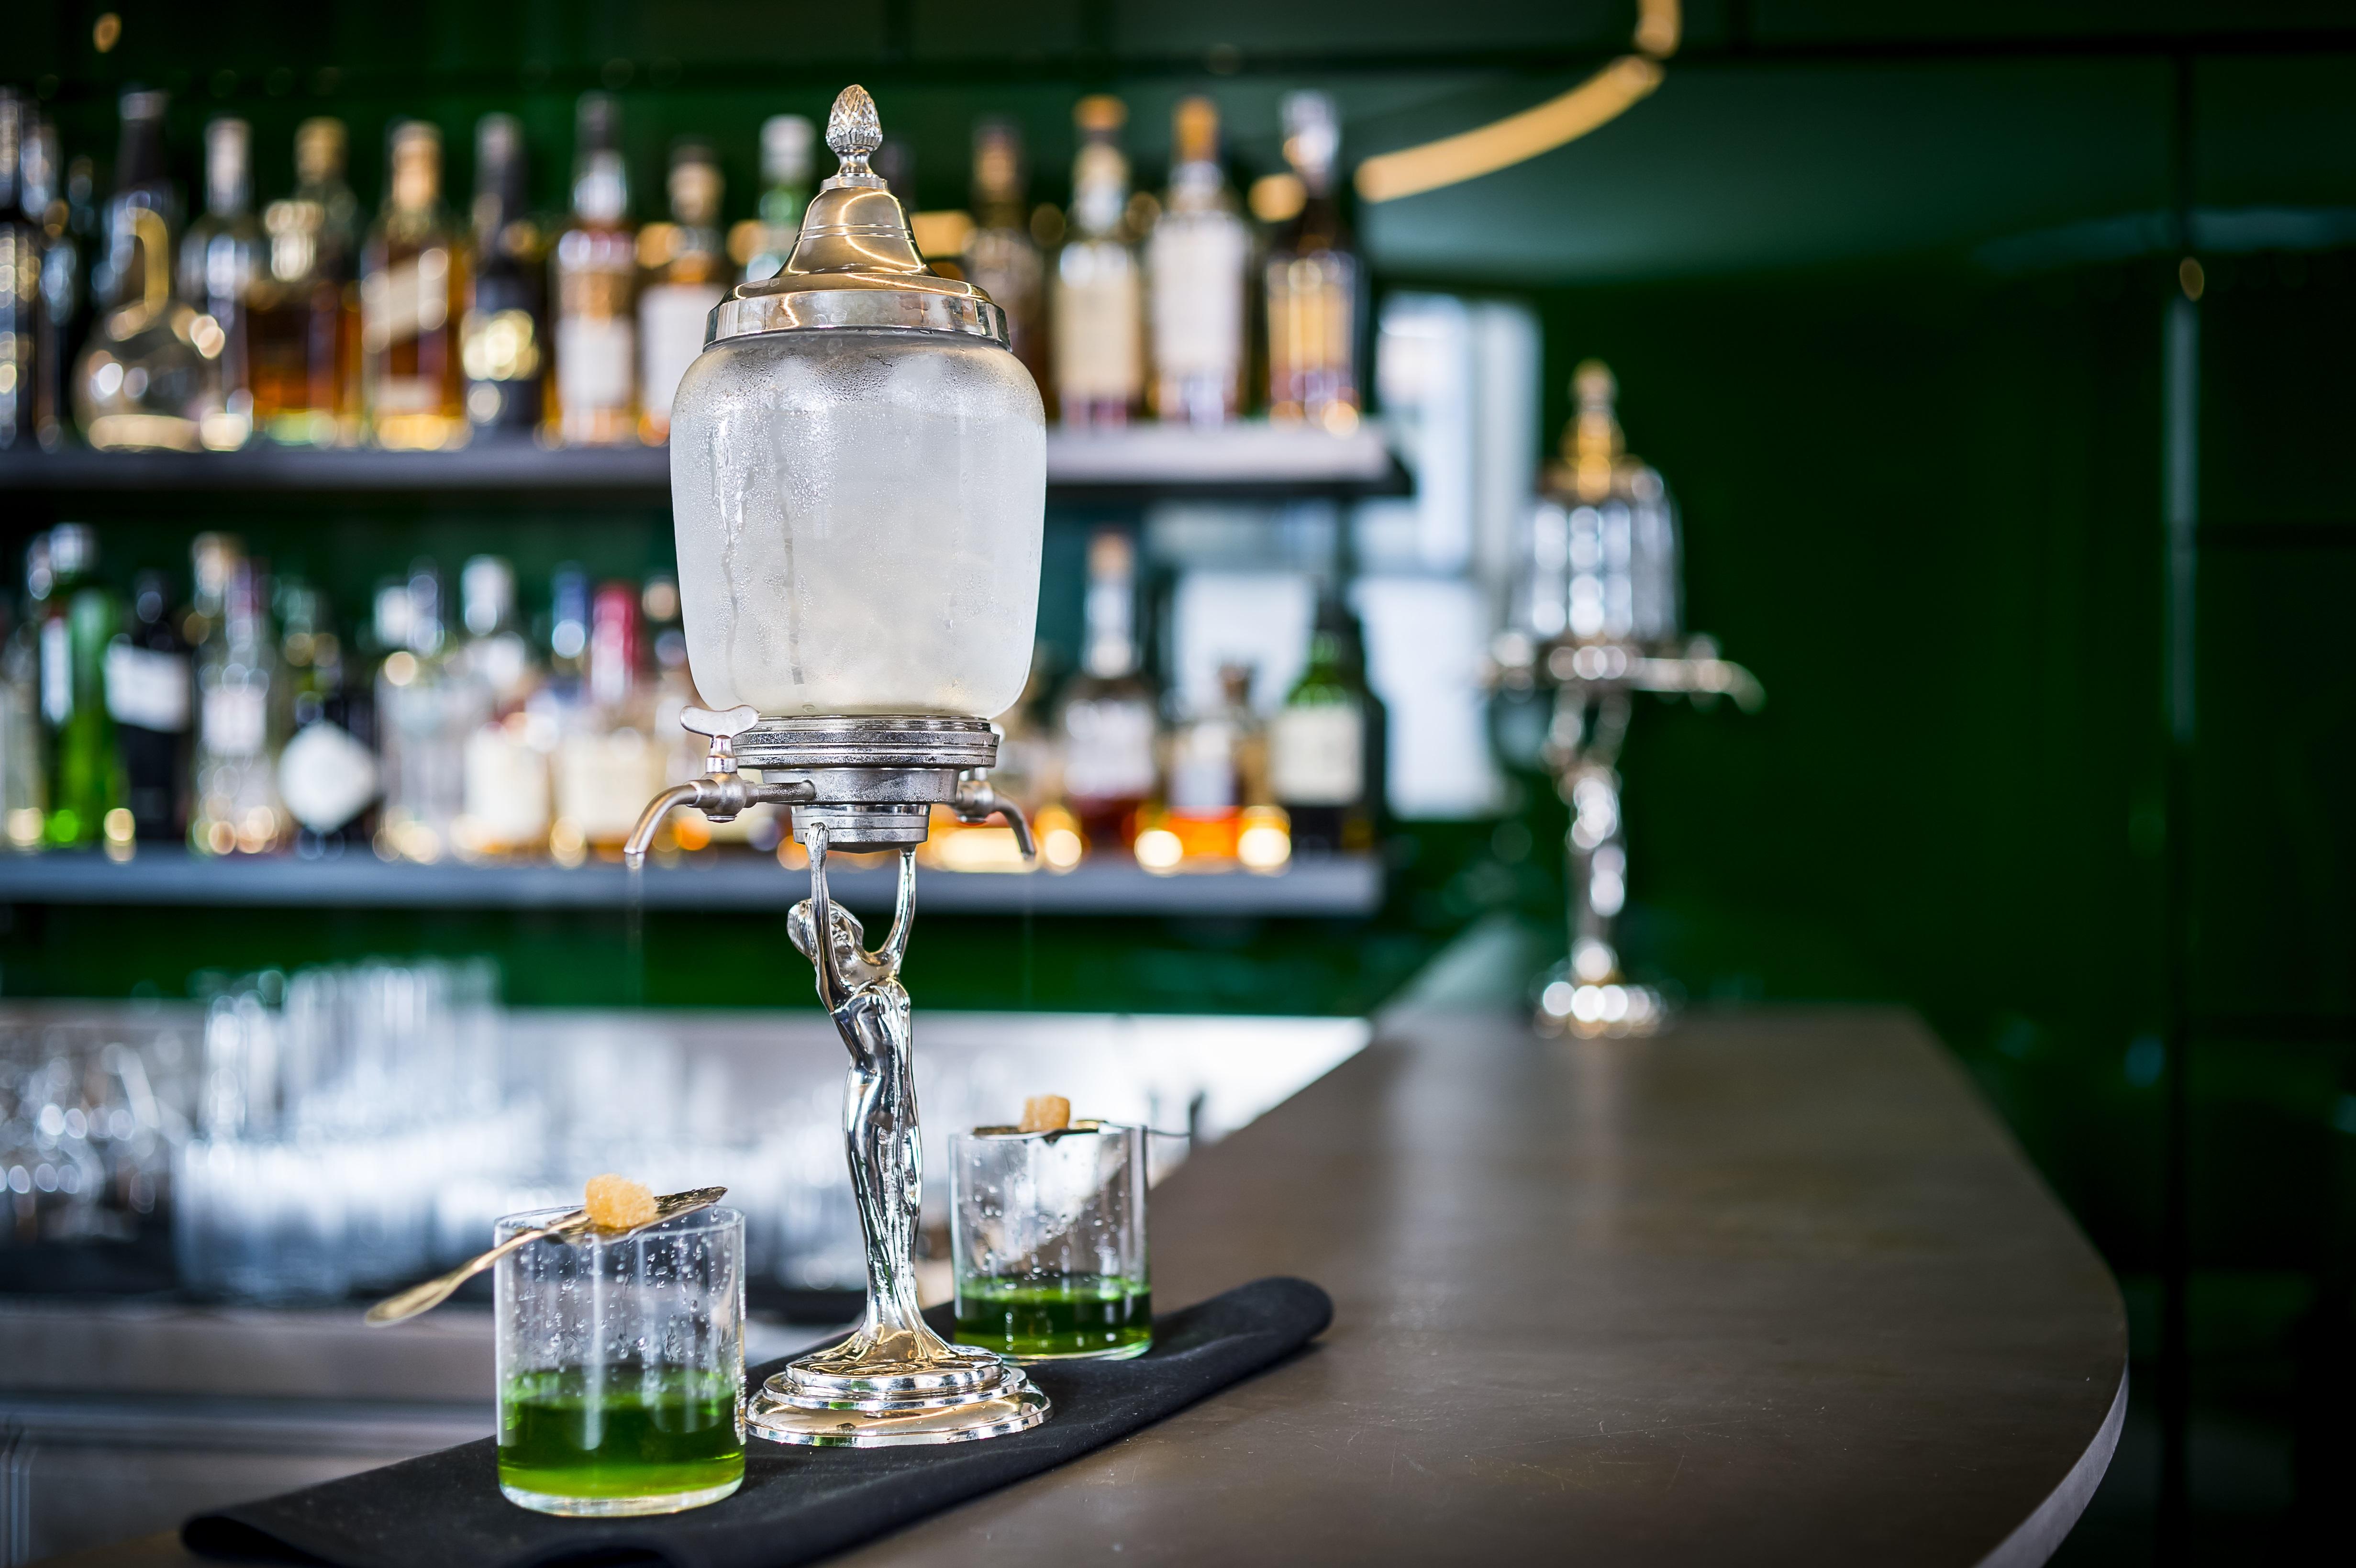 Hotel Cafe Royal - Green Bar - Absinthe